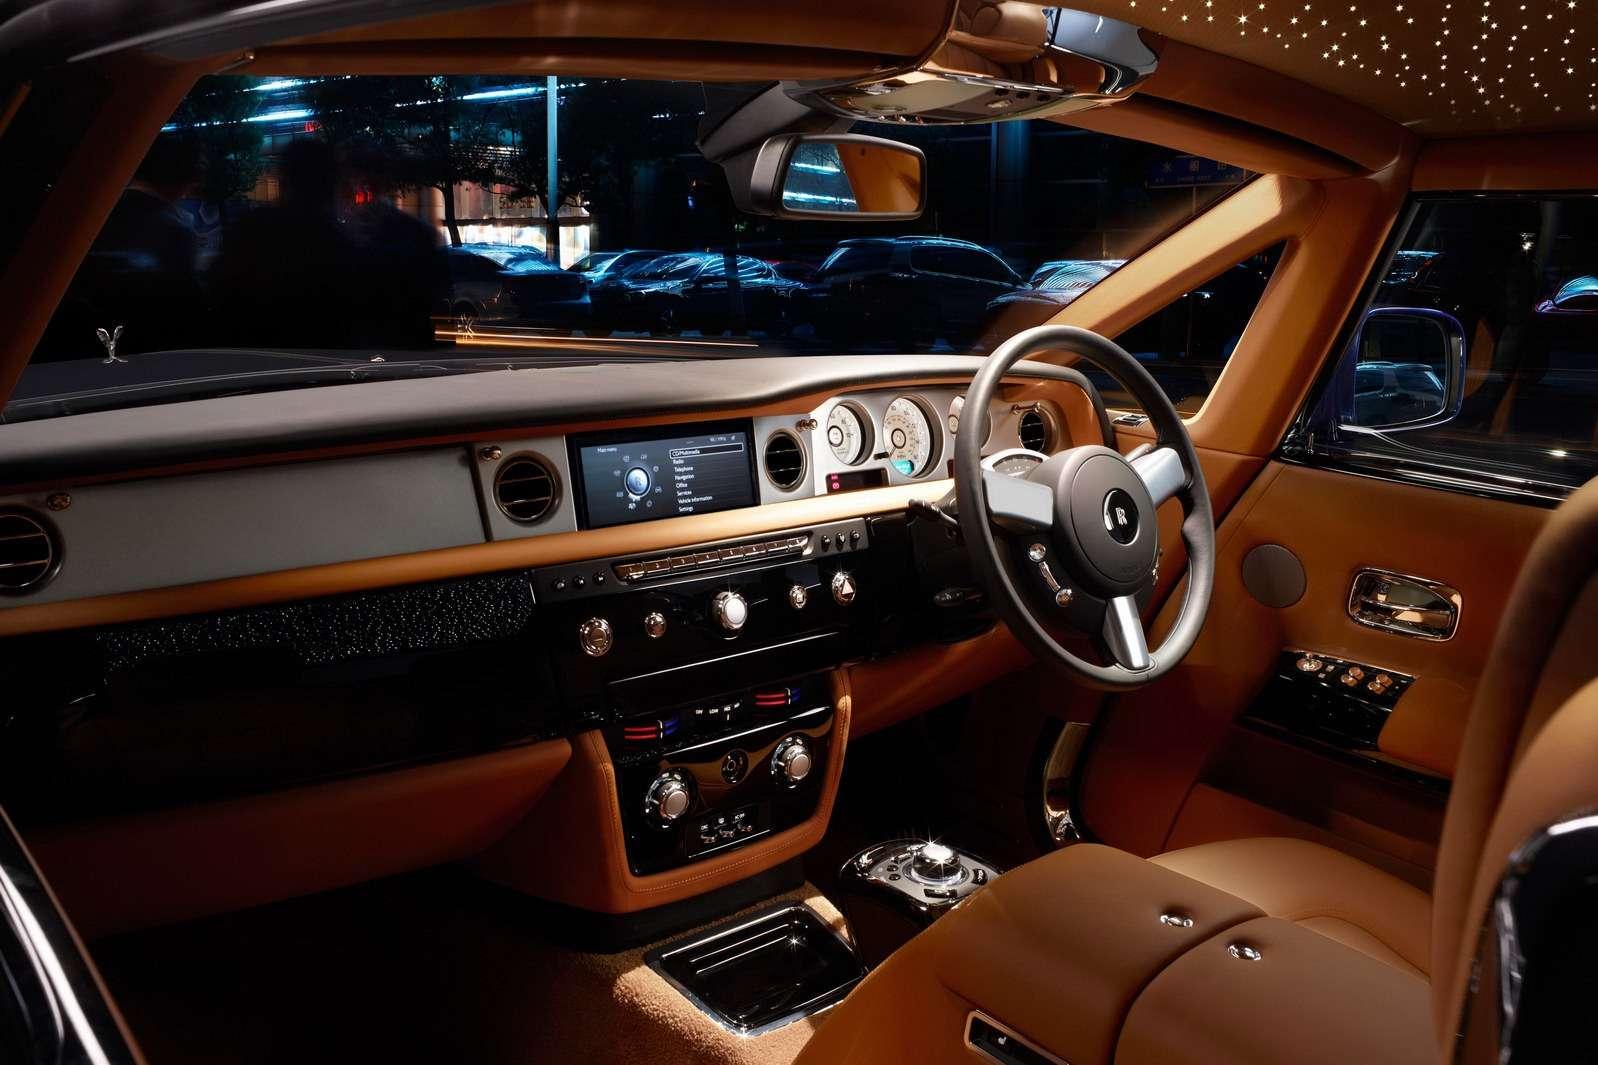 2013 Rolls Royce Phantom